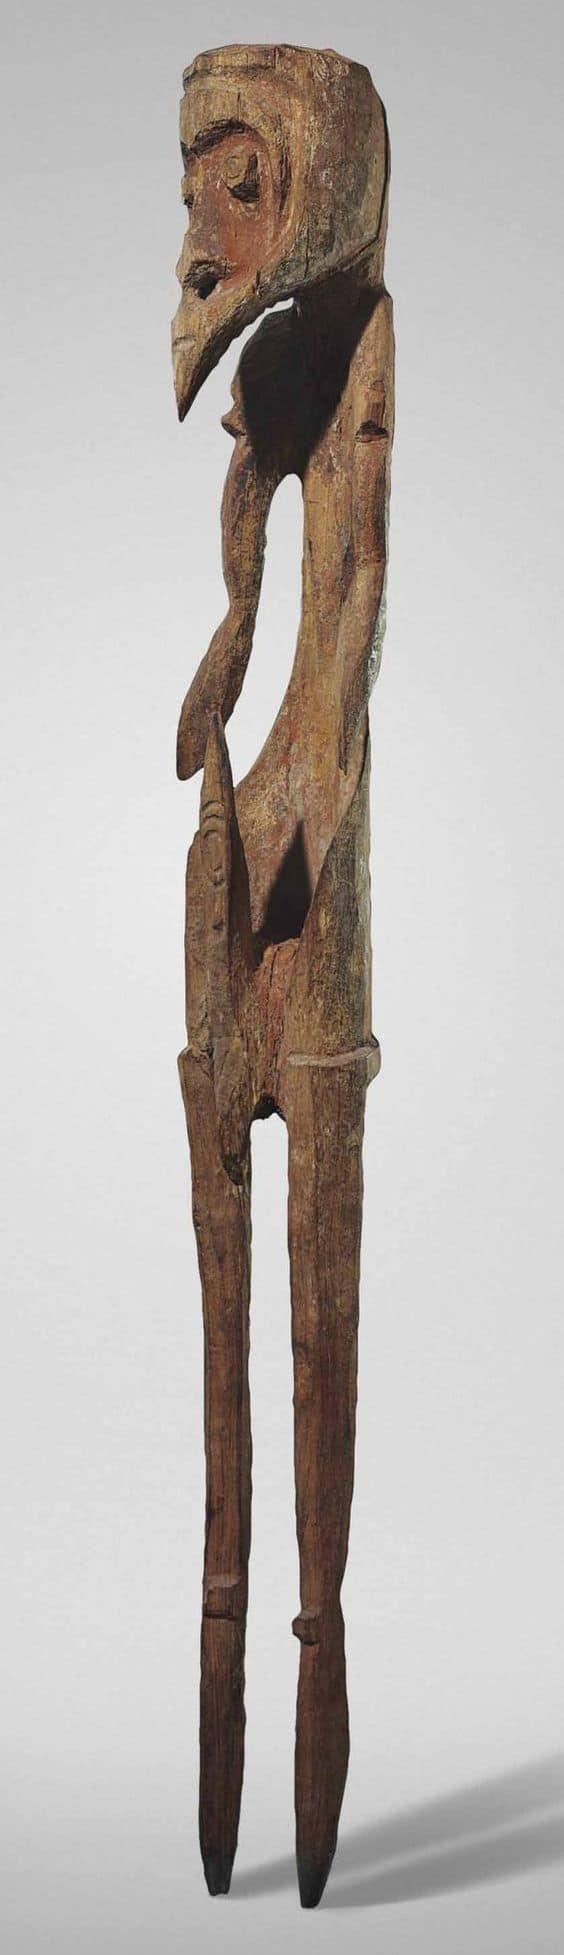 Korowari cave figure